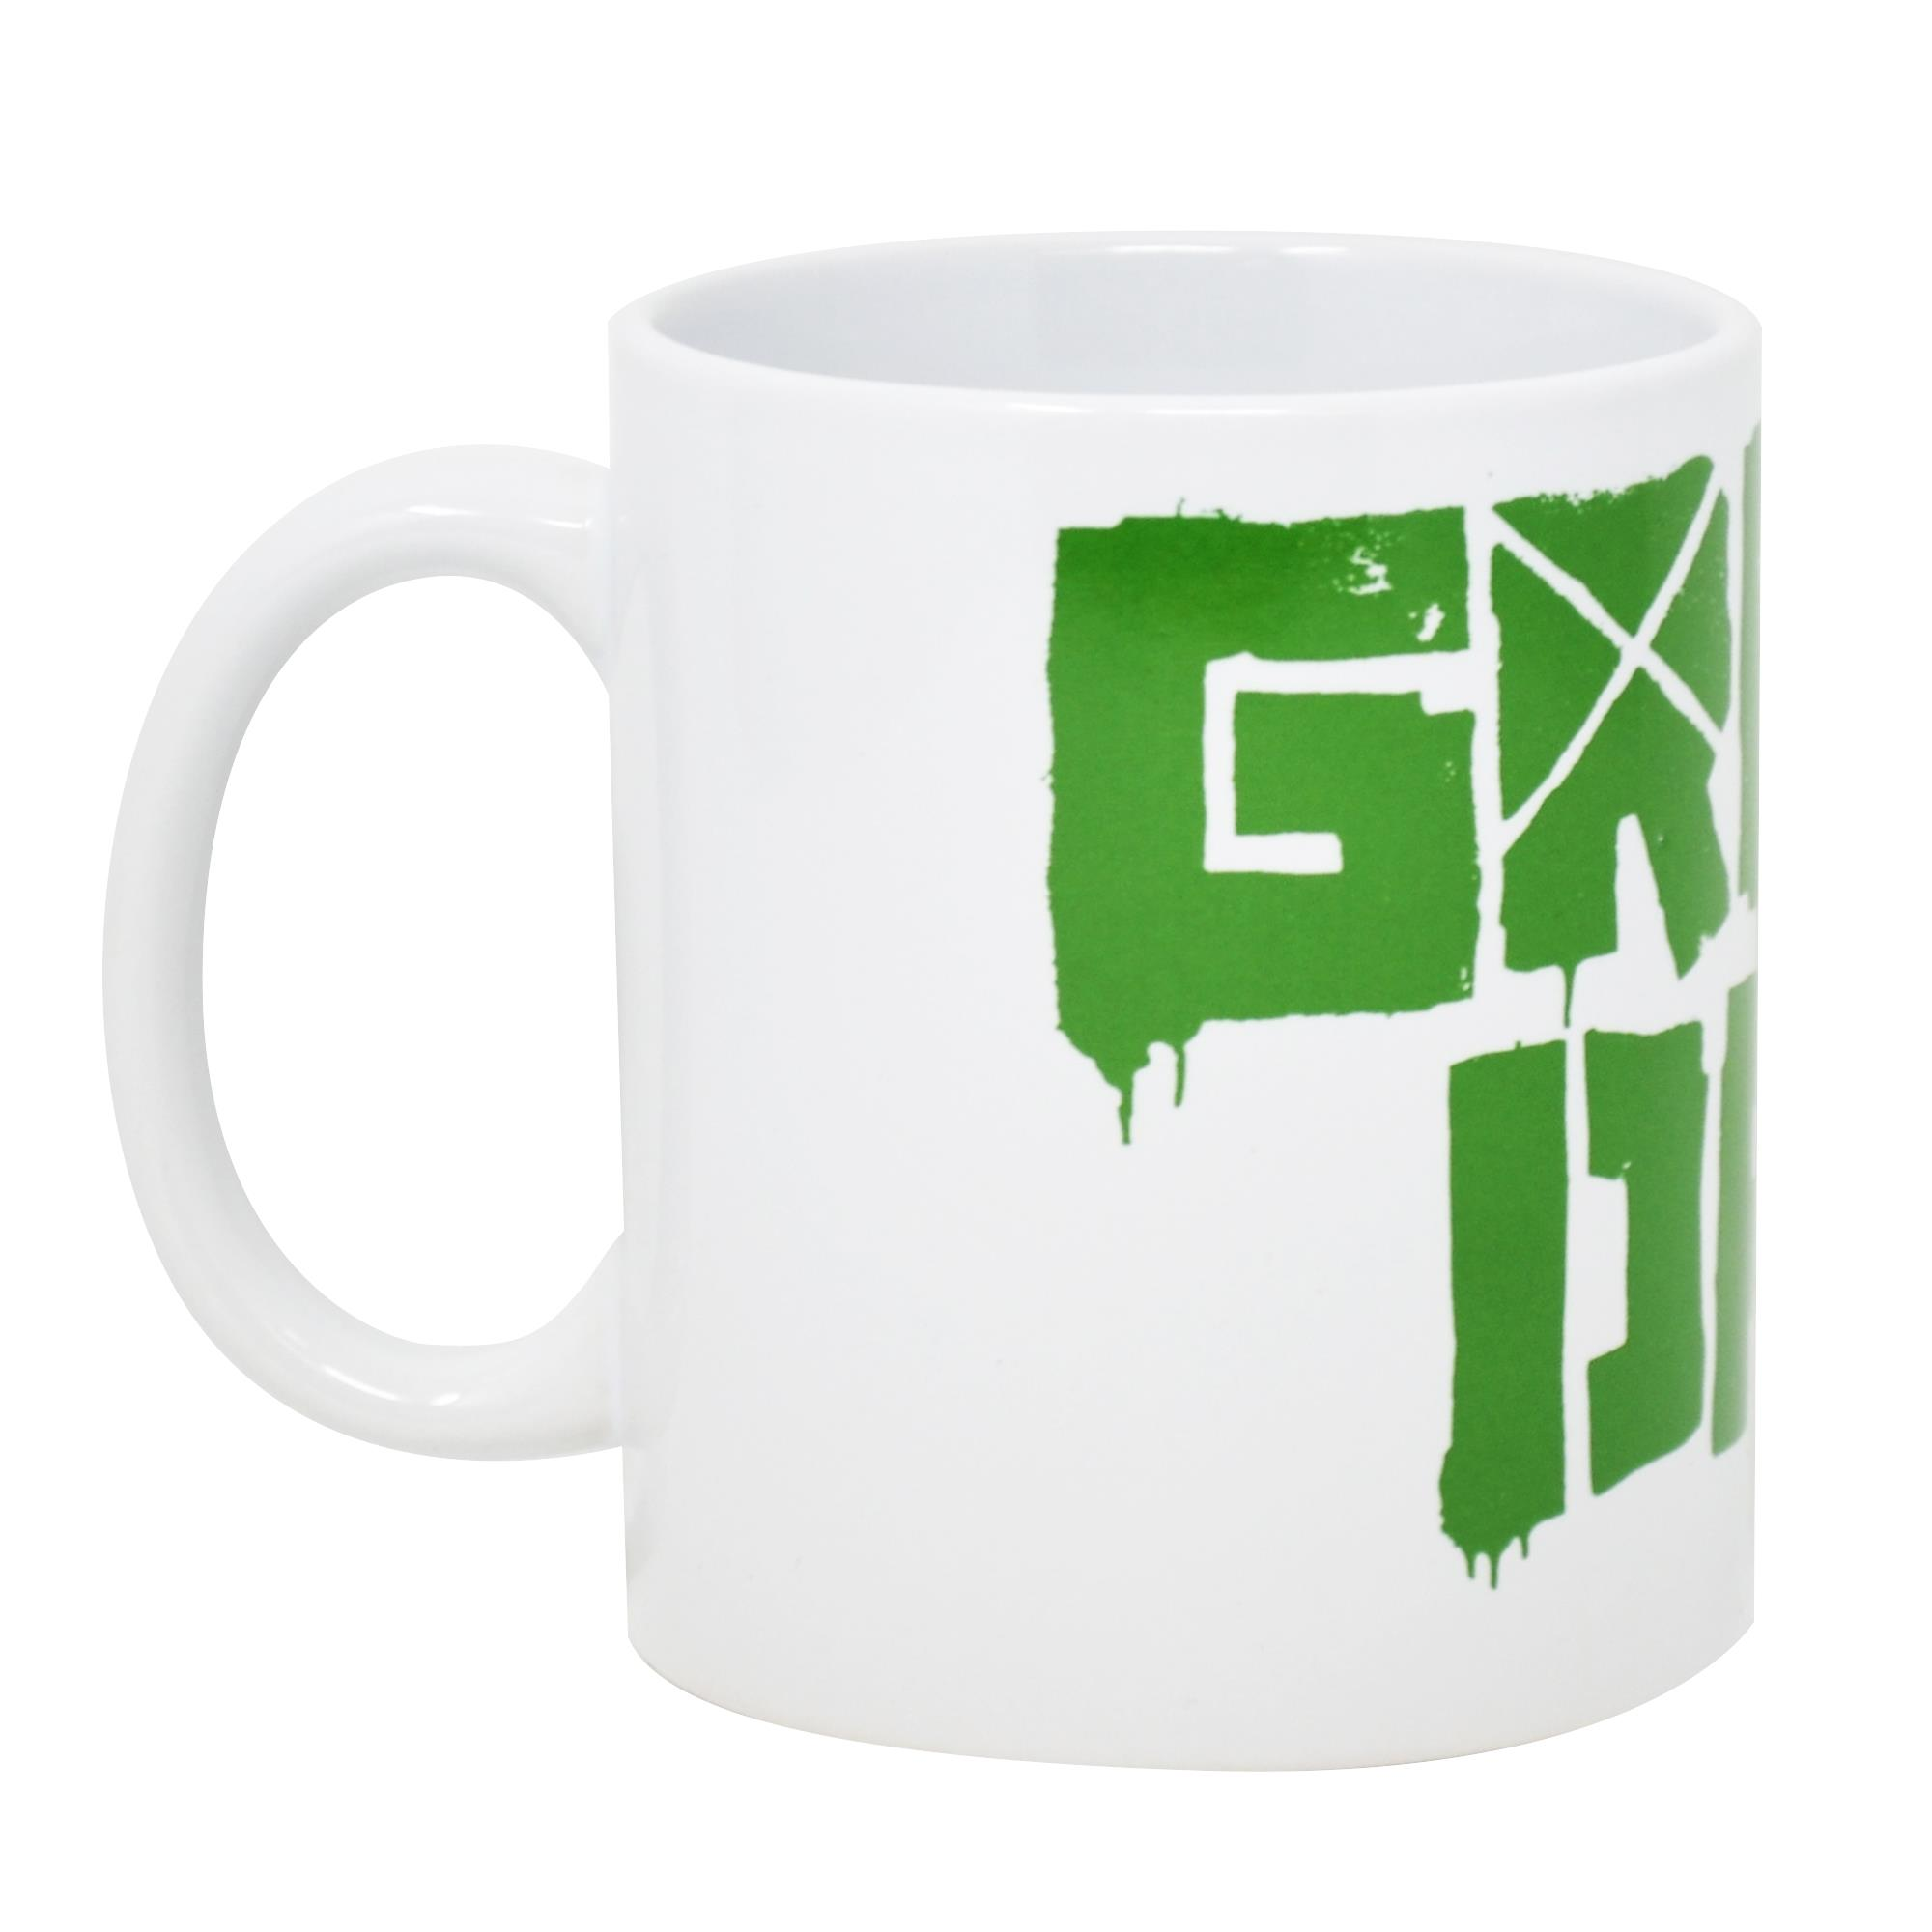 Green Logo Mug